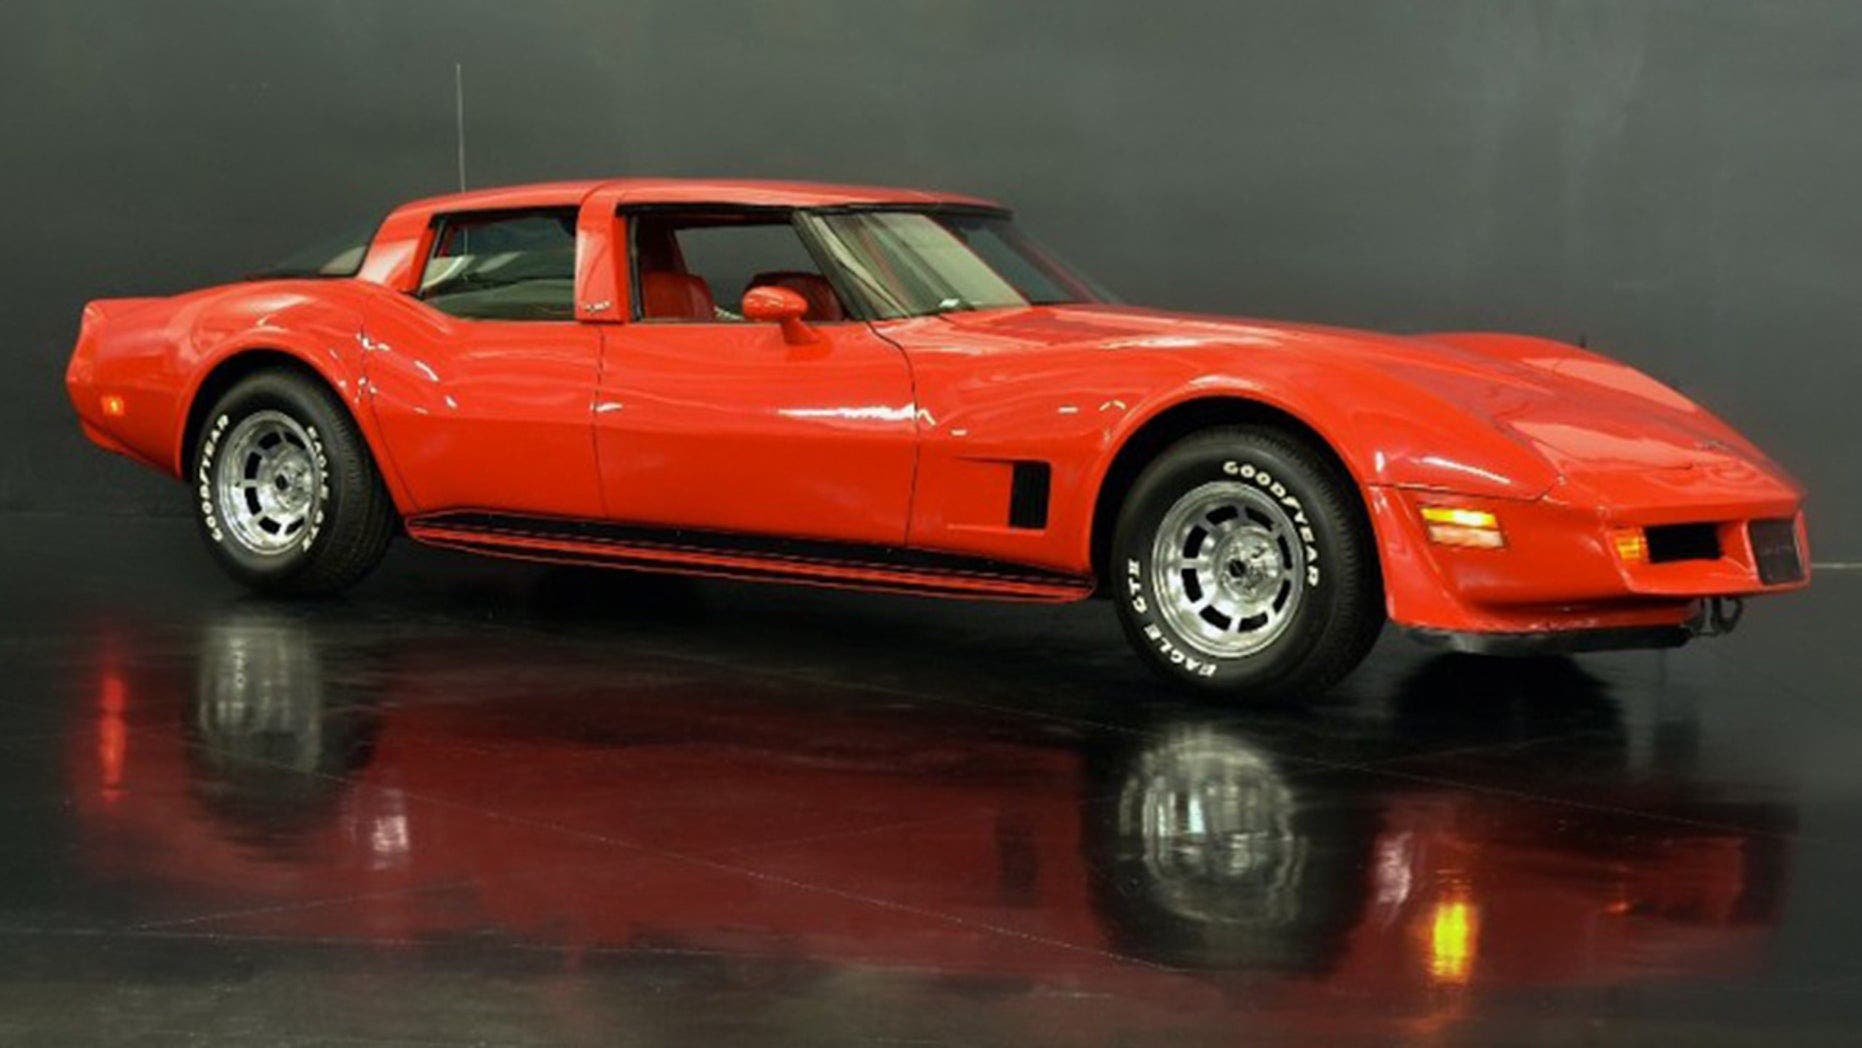 4-seat 1980 Chevrolet Corvette